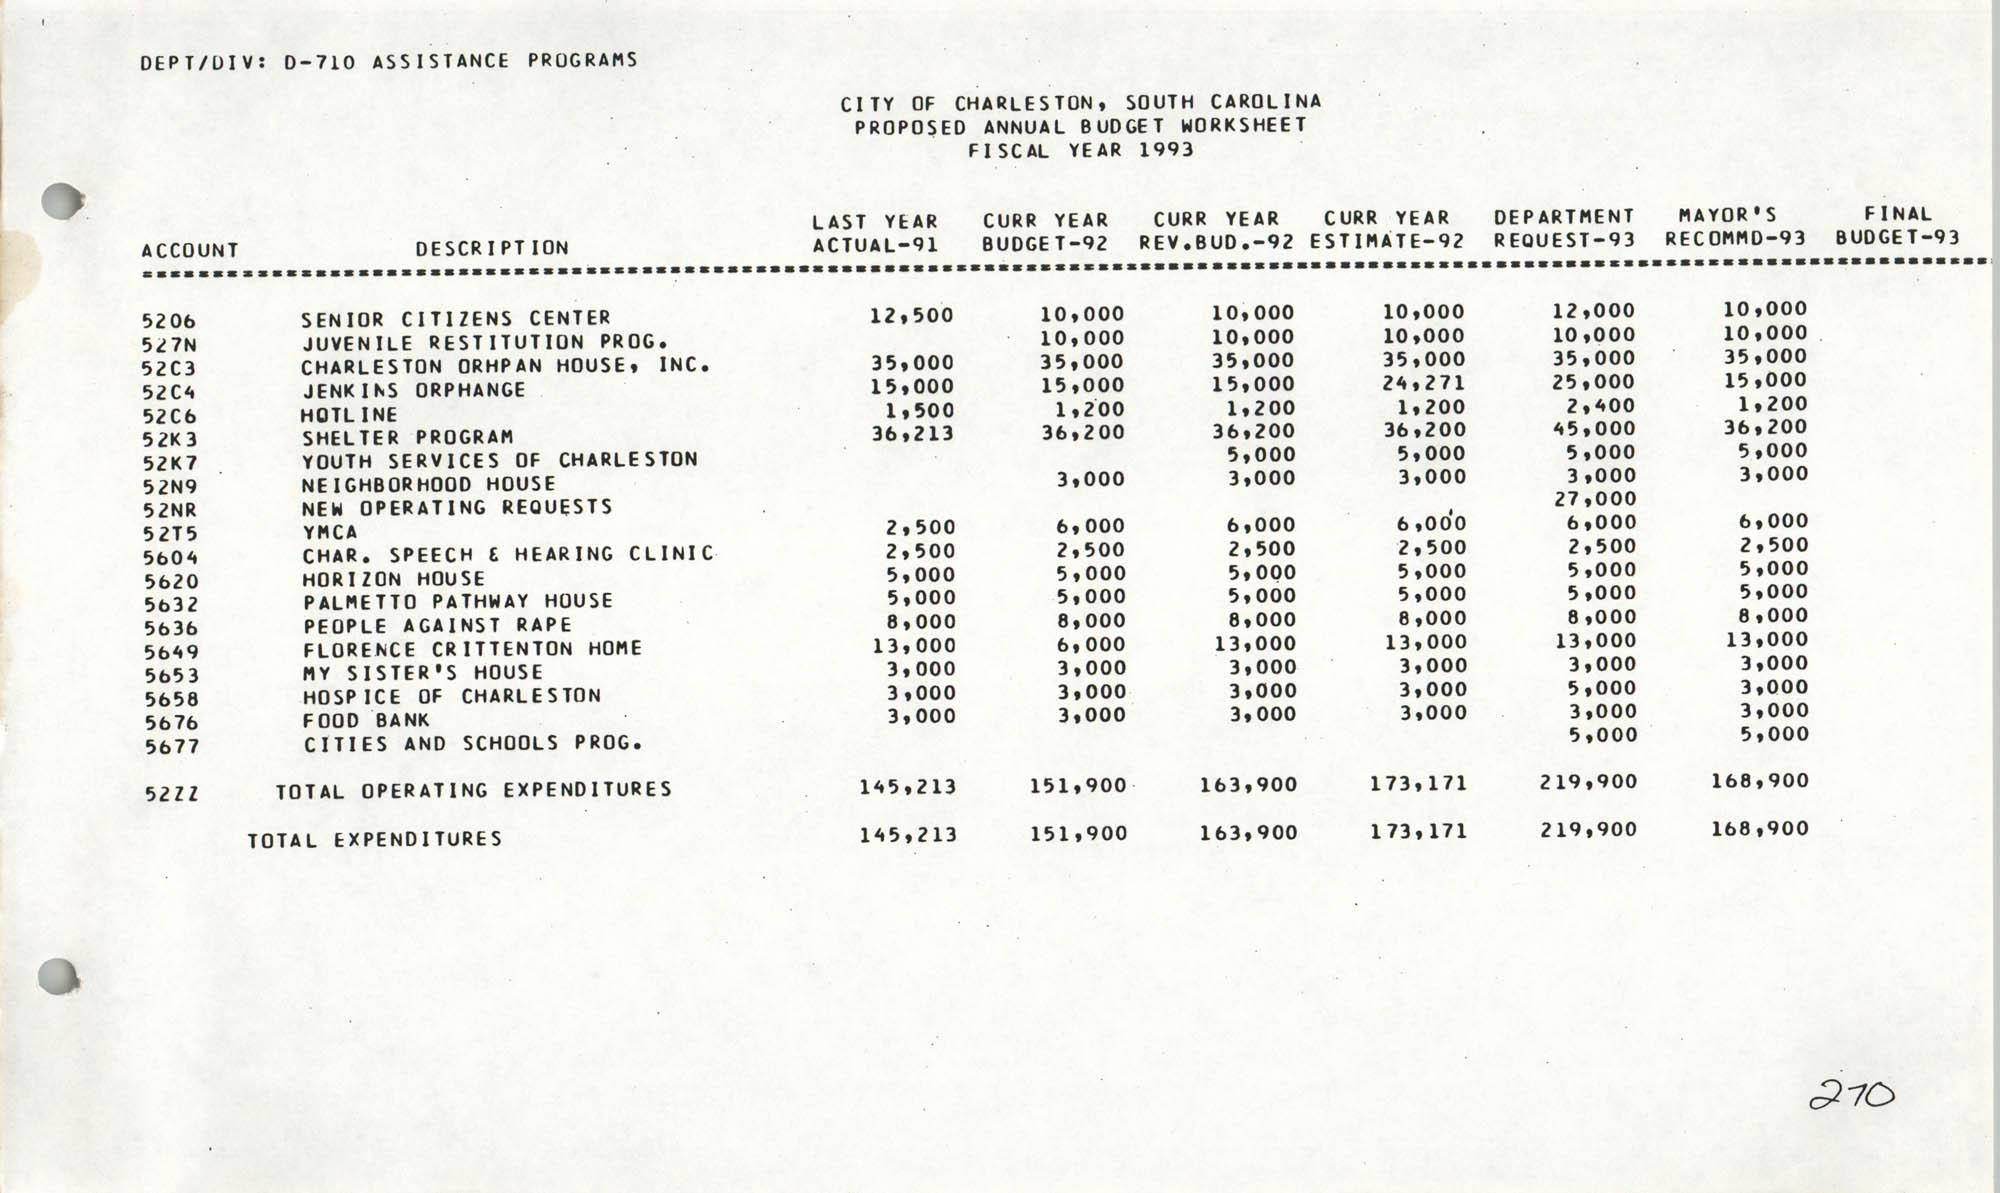 The City Council of Charleston, South Carolina, 1993 Budget, Page 270